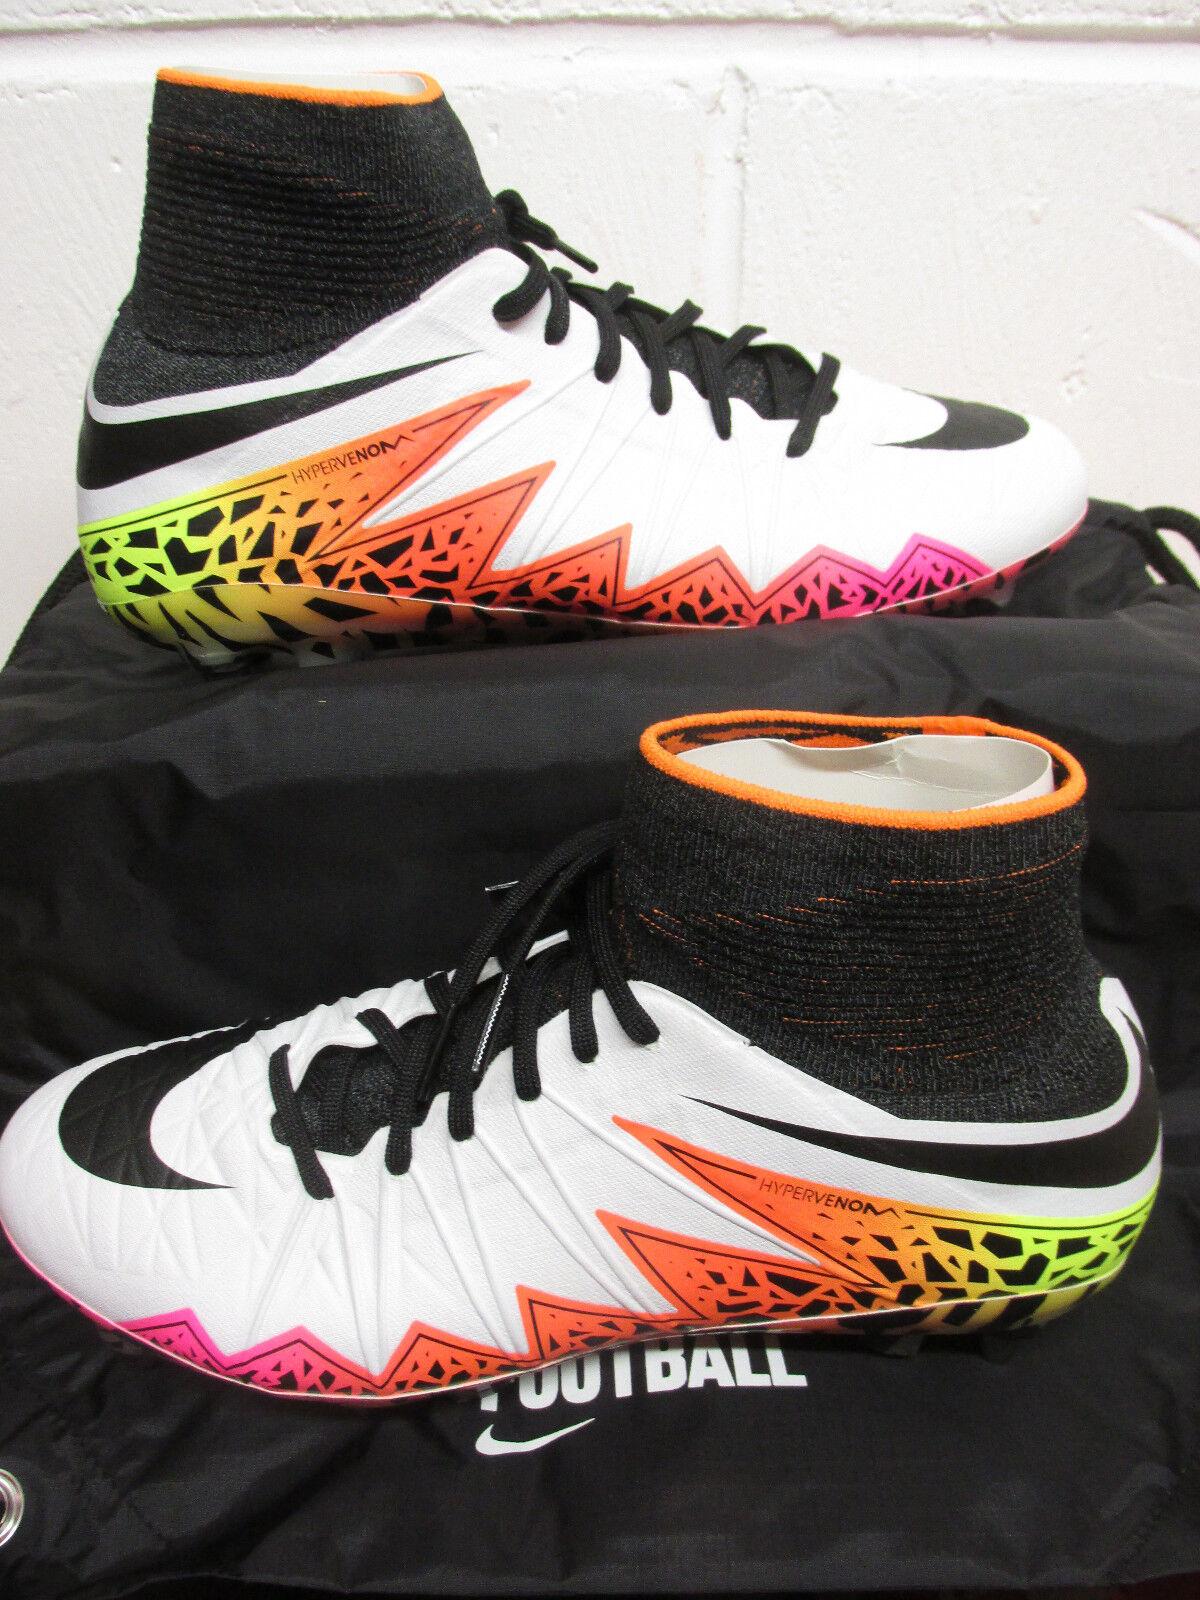 Nike Hypervenom Phantom II SG-Pro Mens Football Boots 747489 109 Soccer Cleats